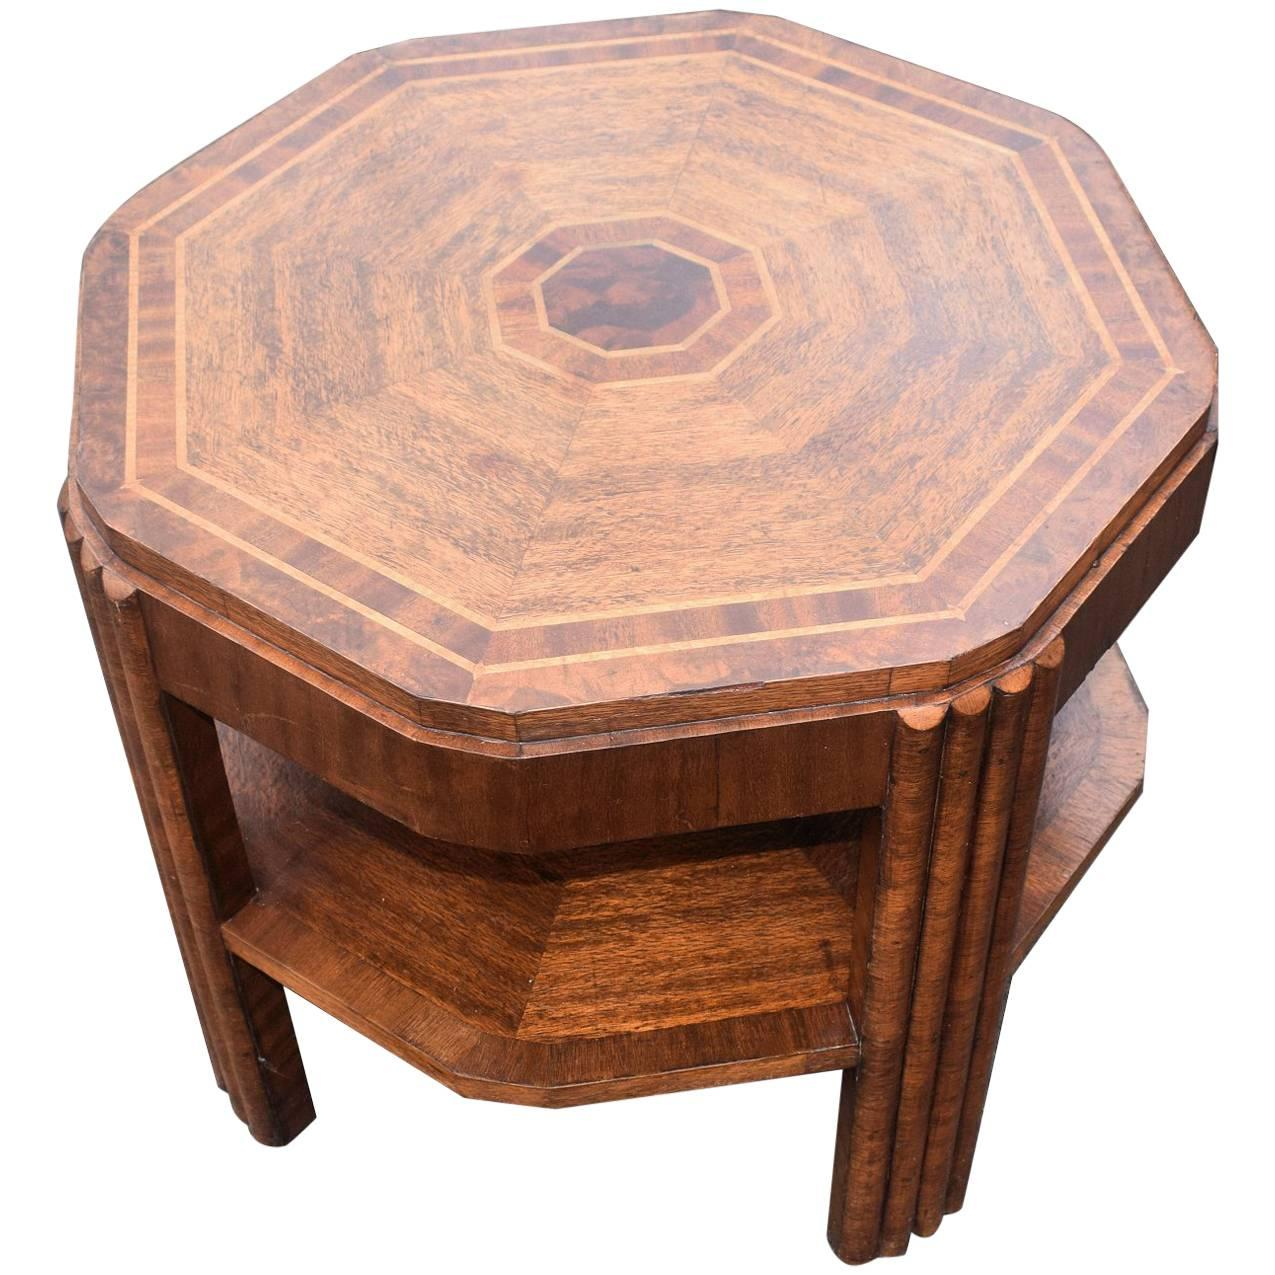 English Art Deco Walnut and Oak Book Table